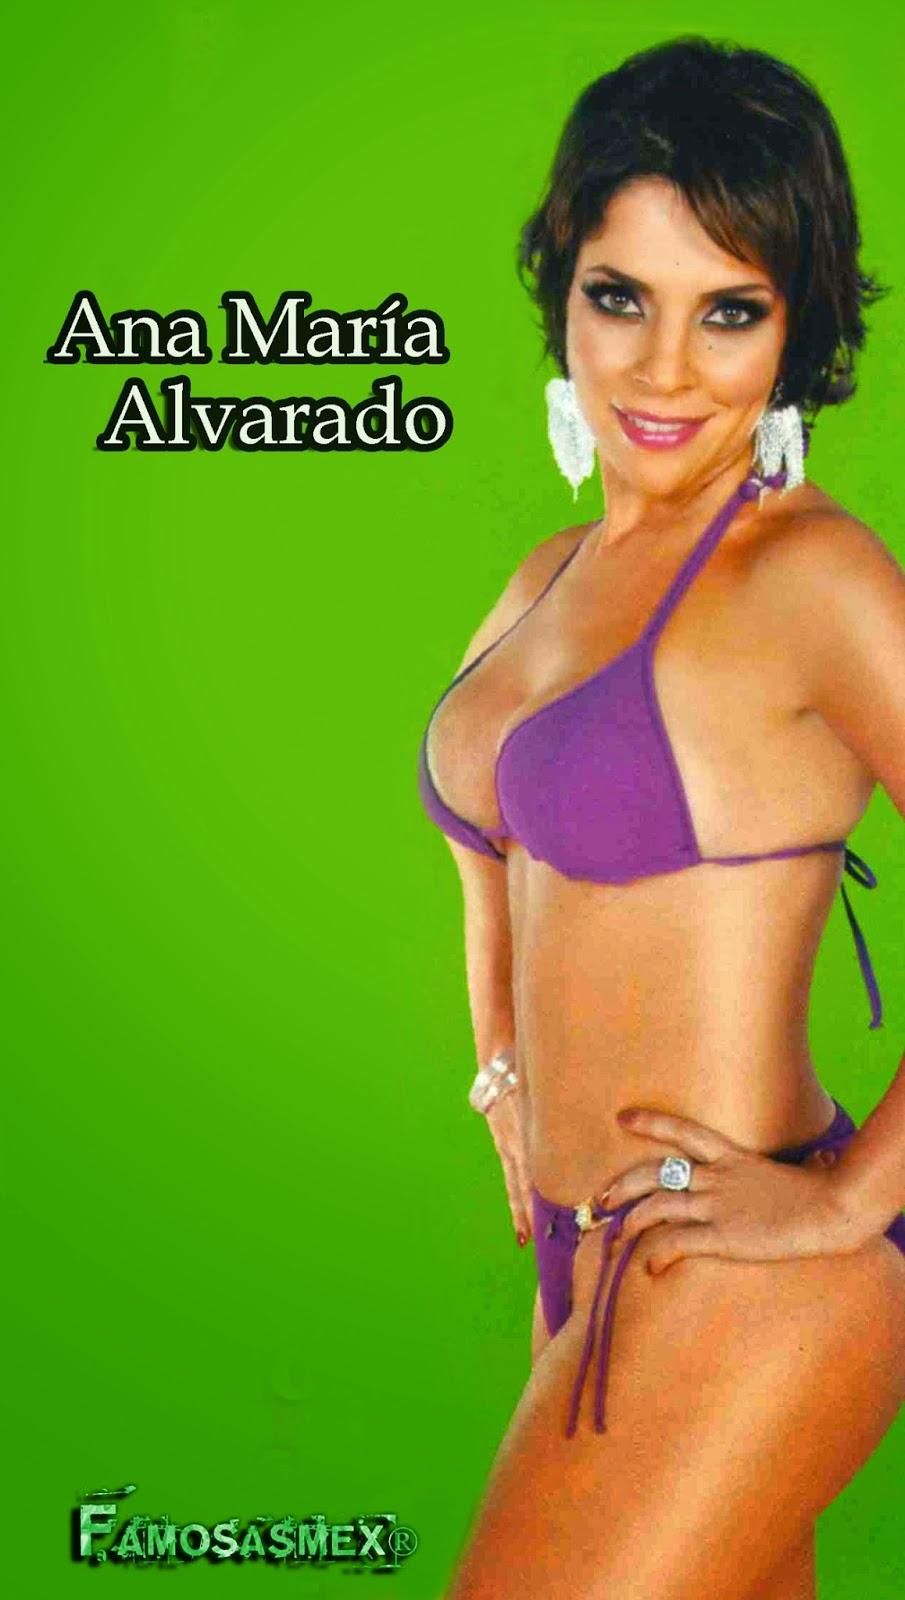 Ana María Alvarado Superclick TvYNovelas 2009 - Sexy Modelos Famosas